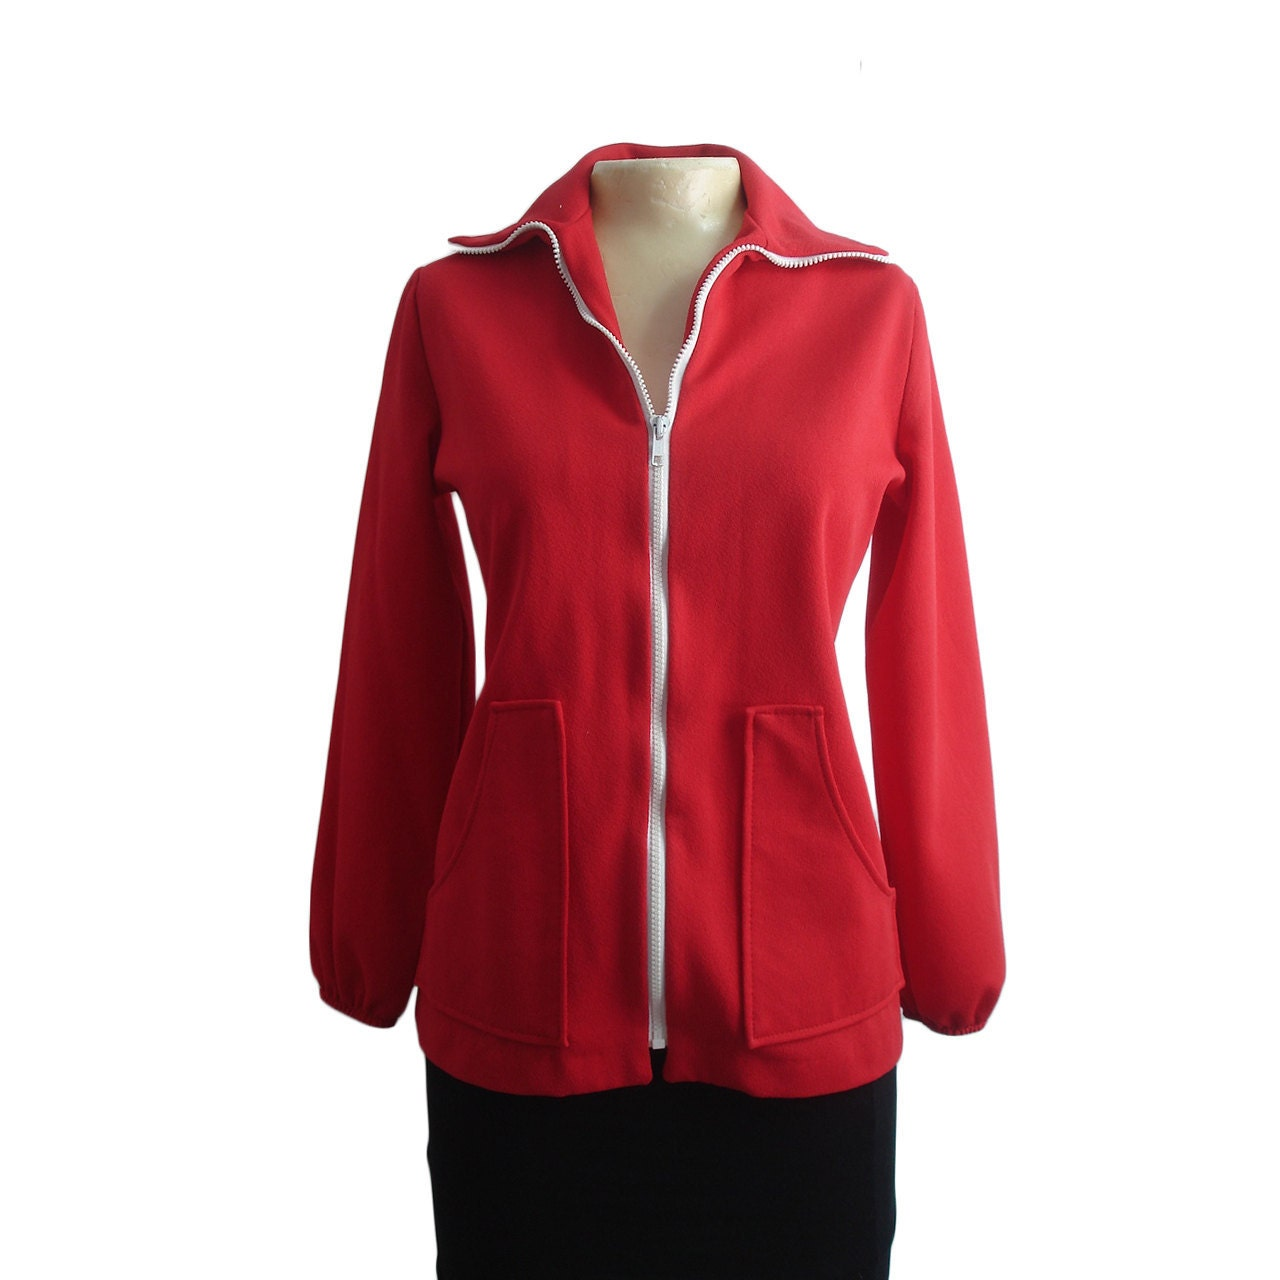 Vintage 70s Red Warm Up Jacket, Medium - ModernGhostBK